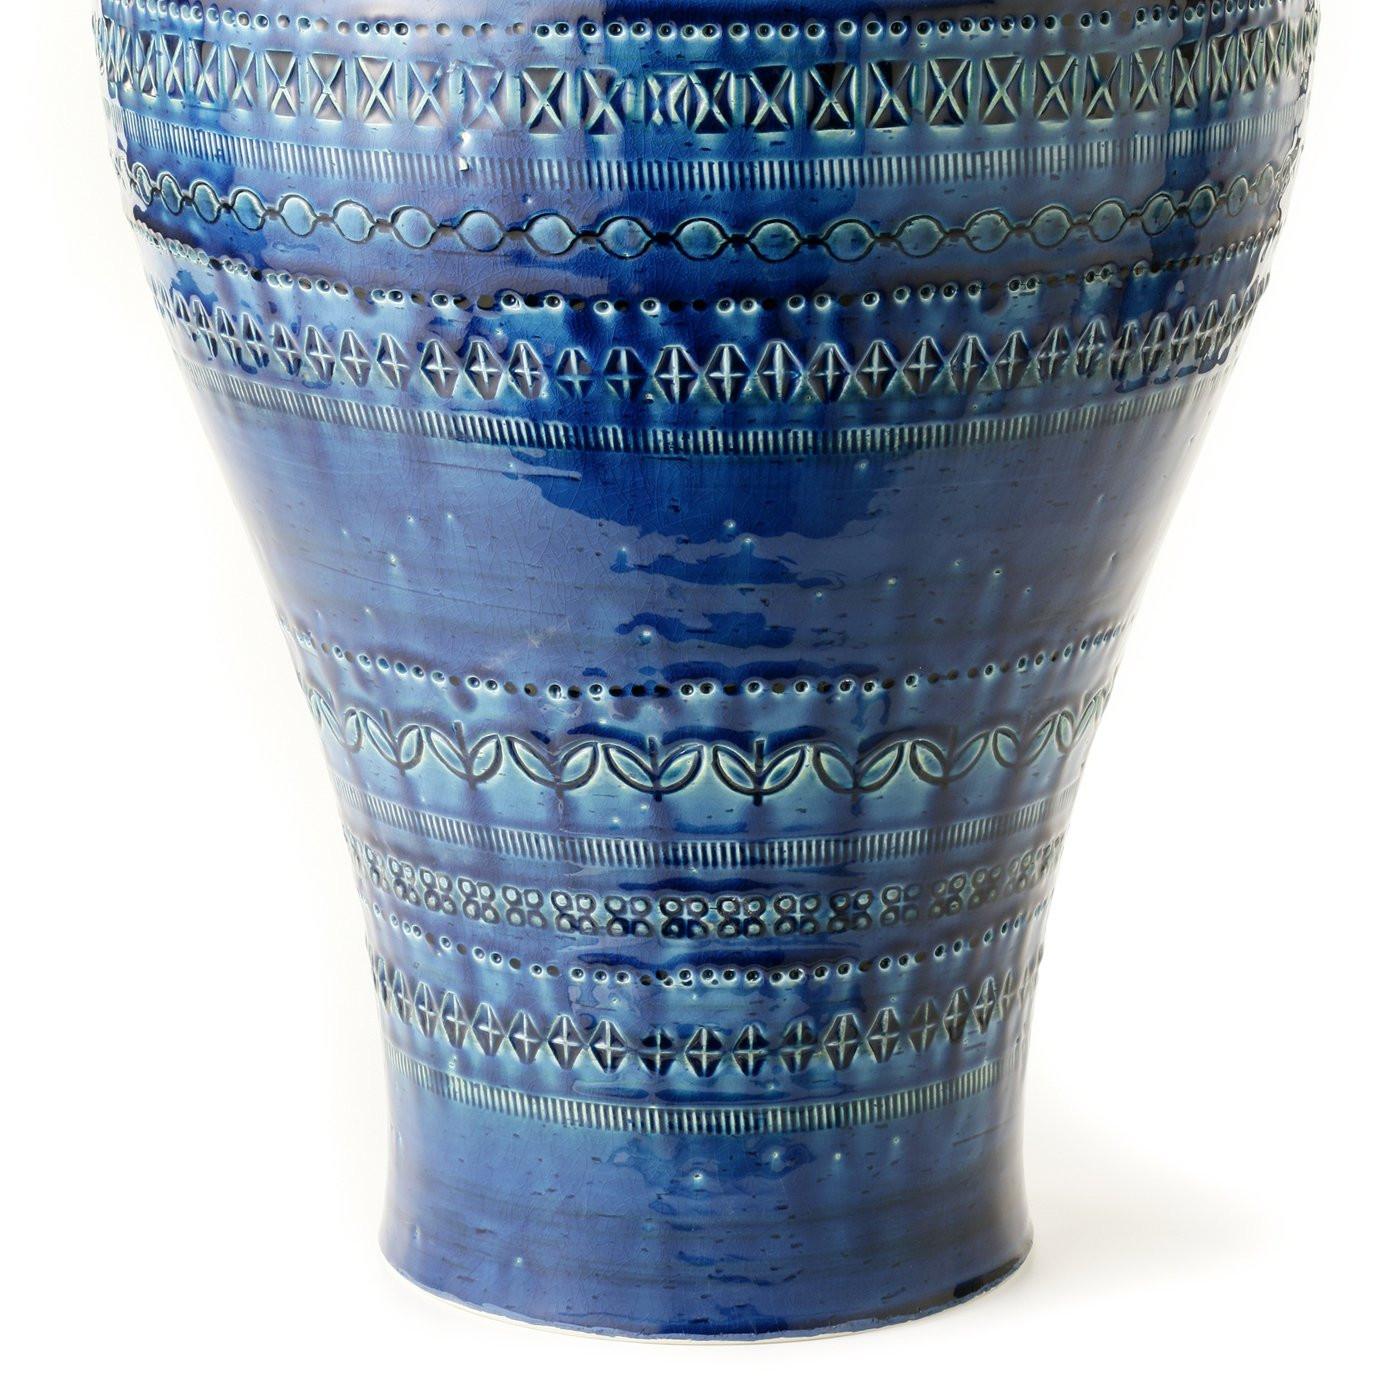 20 inch cylinder vases of blue vase by aldo londi for sale at 1stdibs intended for bitofi 016 b20161012 25813 1l0yqgt org